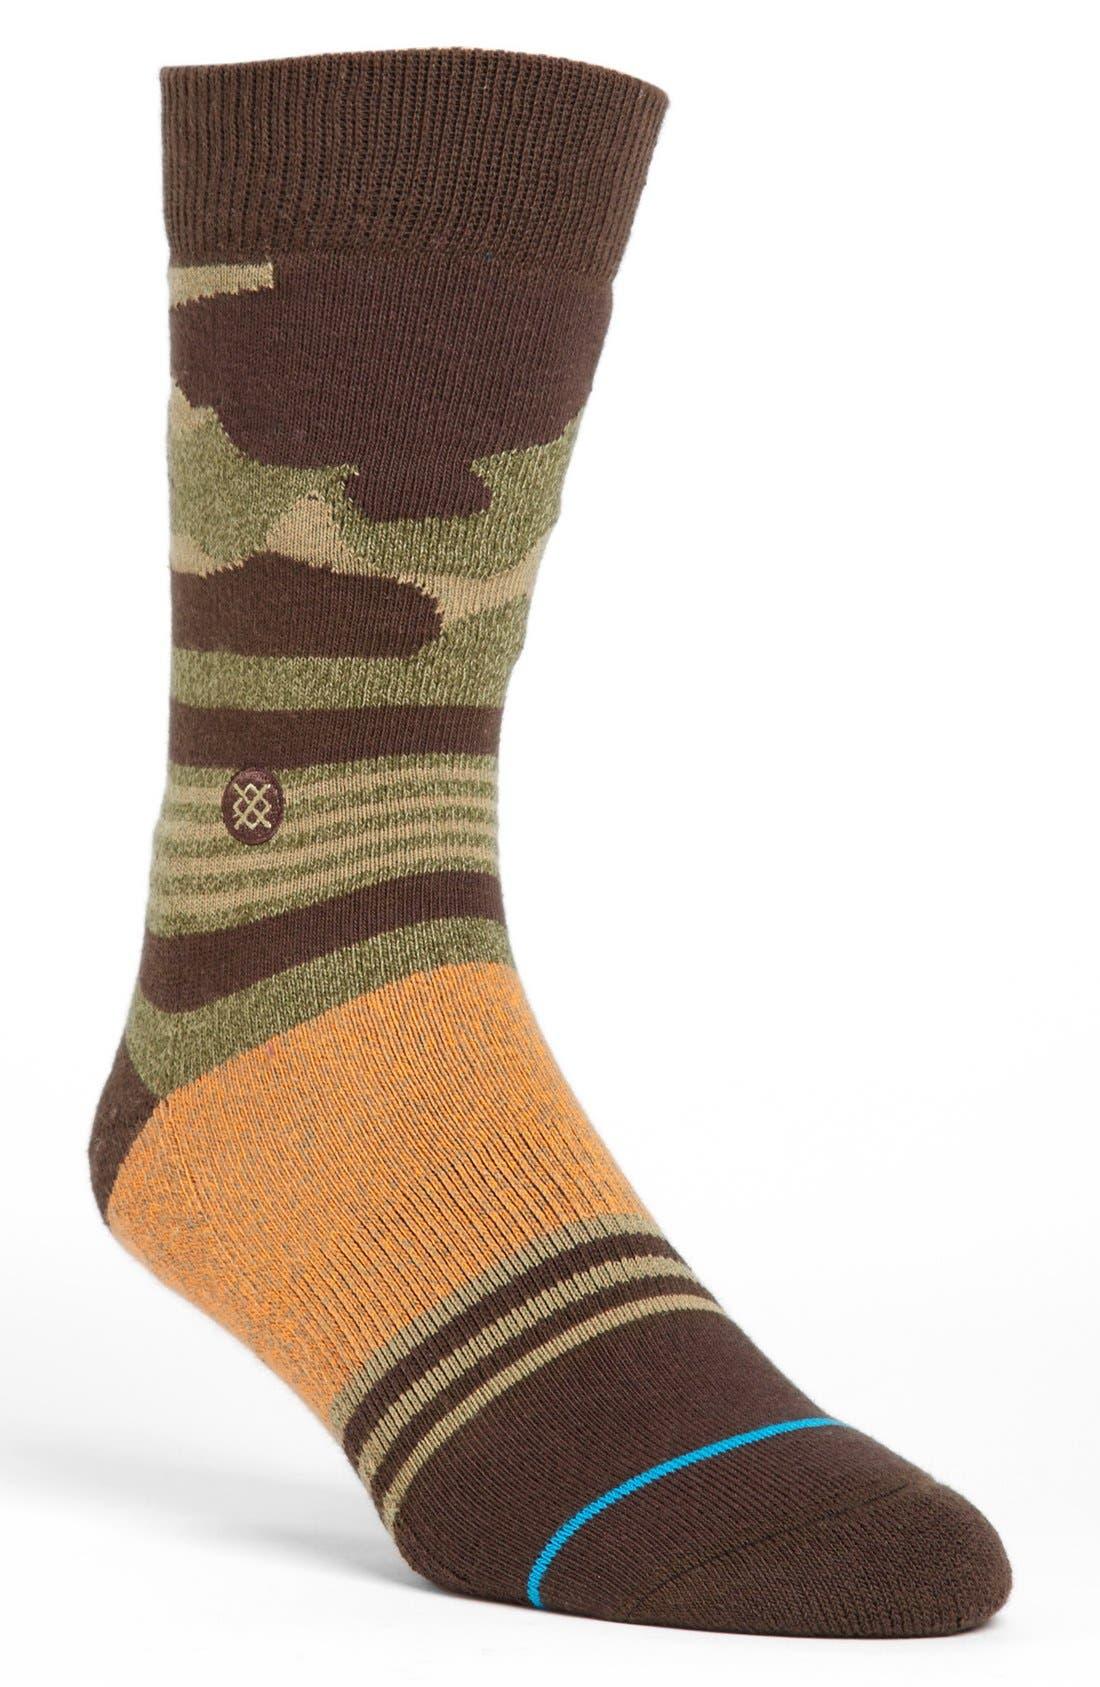 Main Image - Stance 'Basilon' Socks